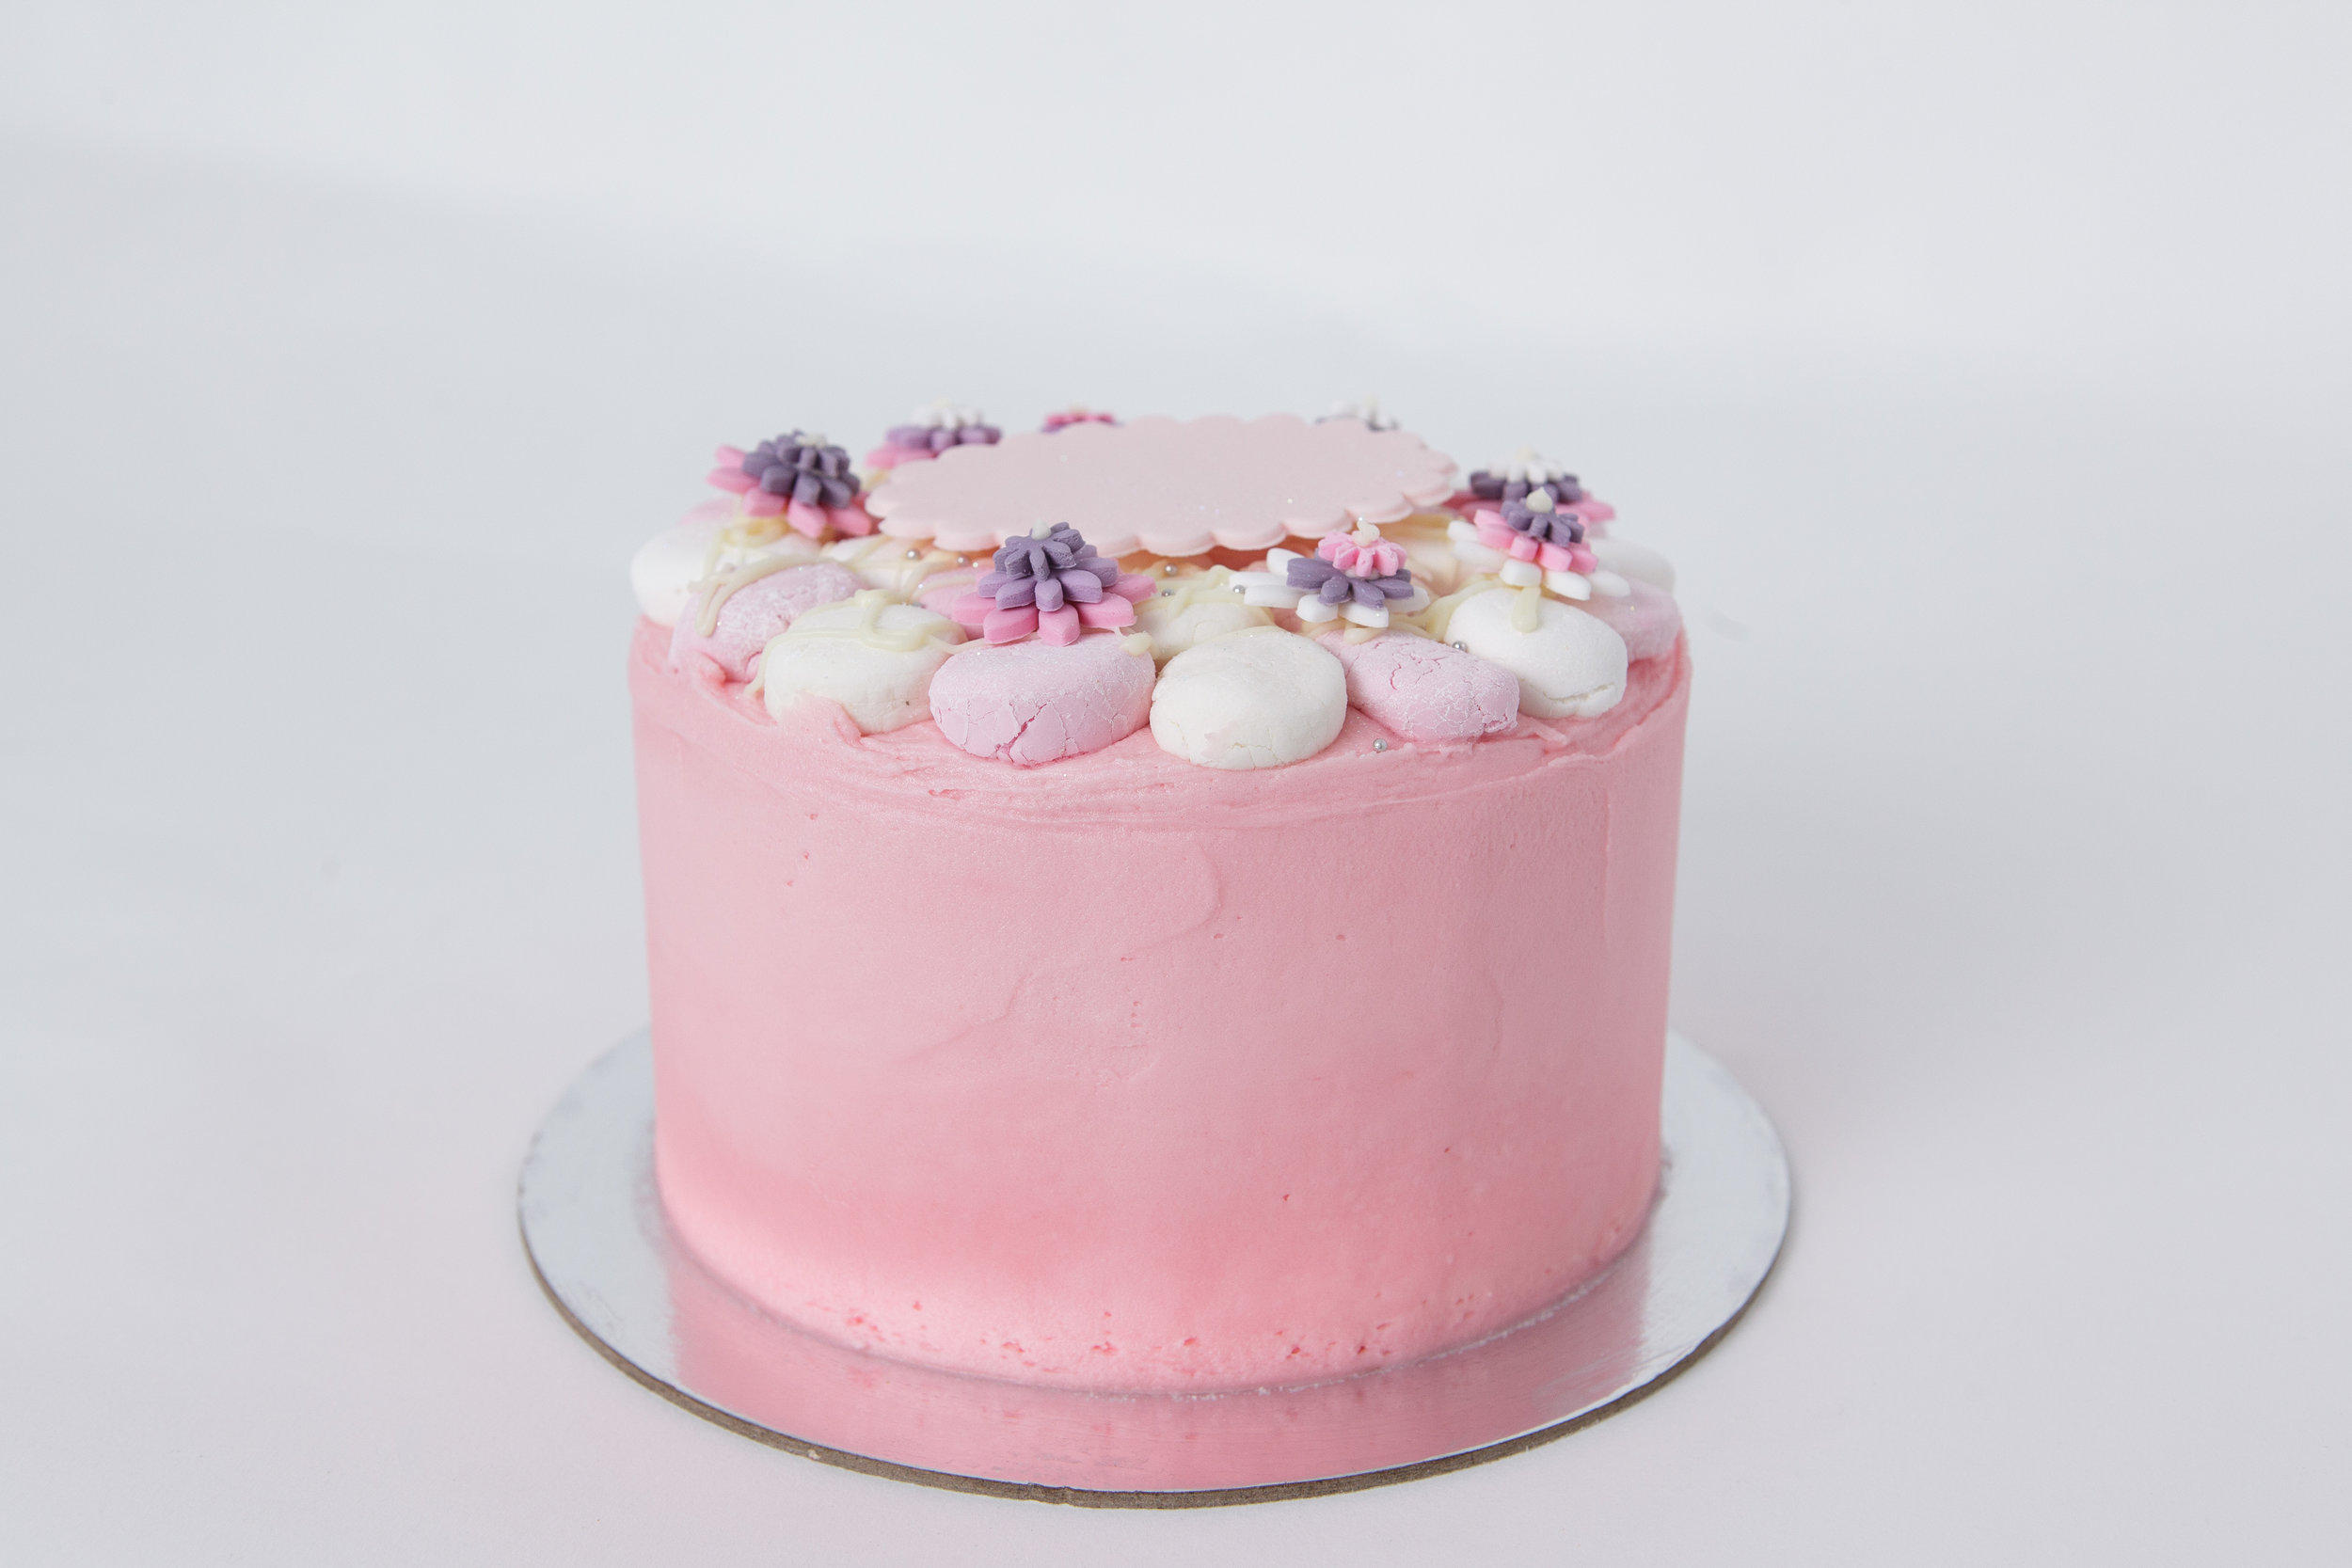 vanillapod_webstore_cakes-32.jpg